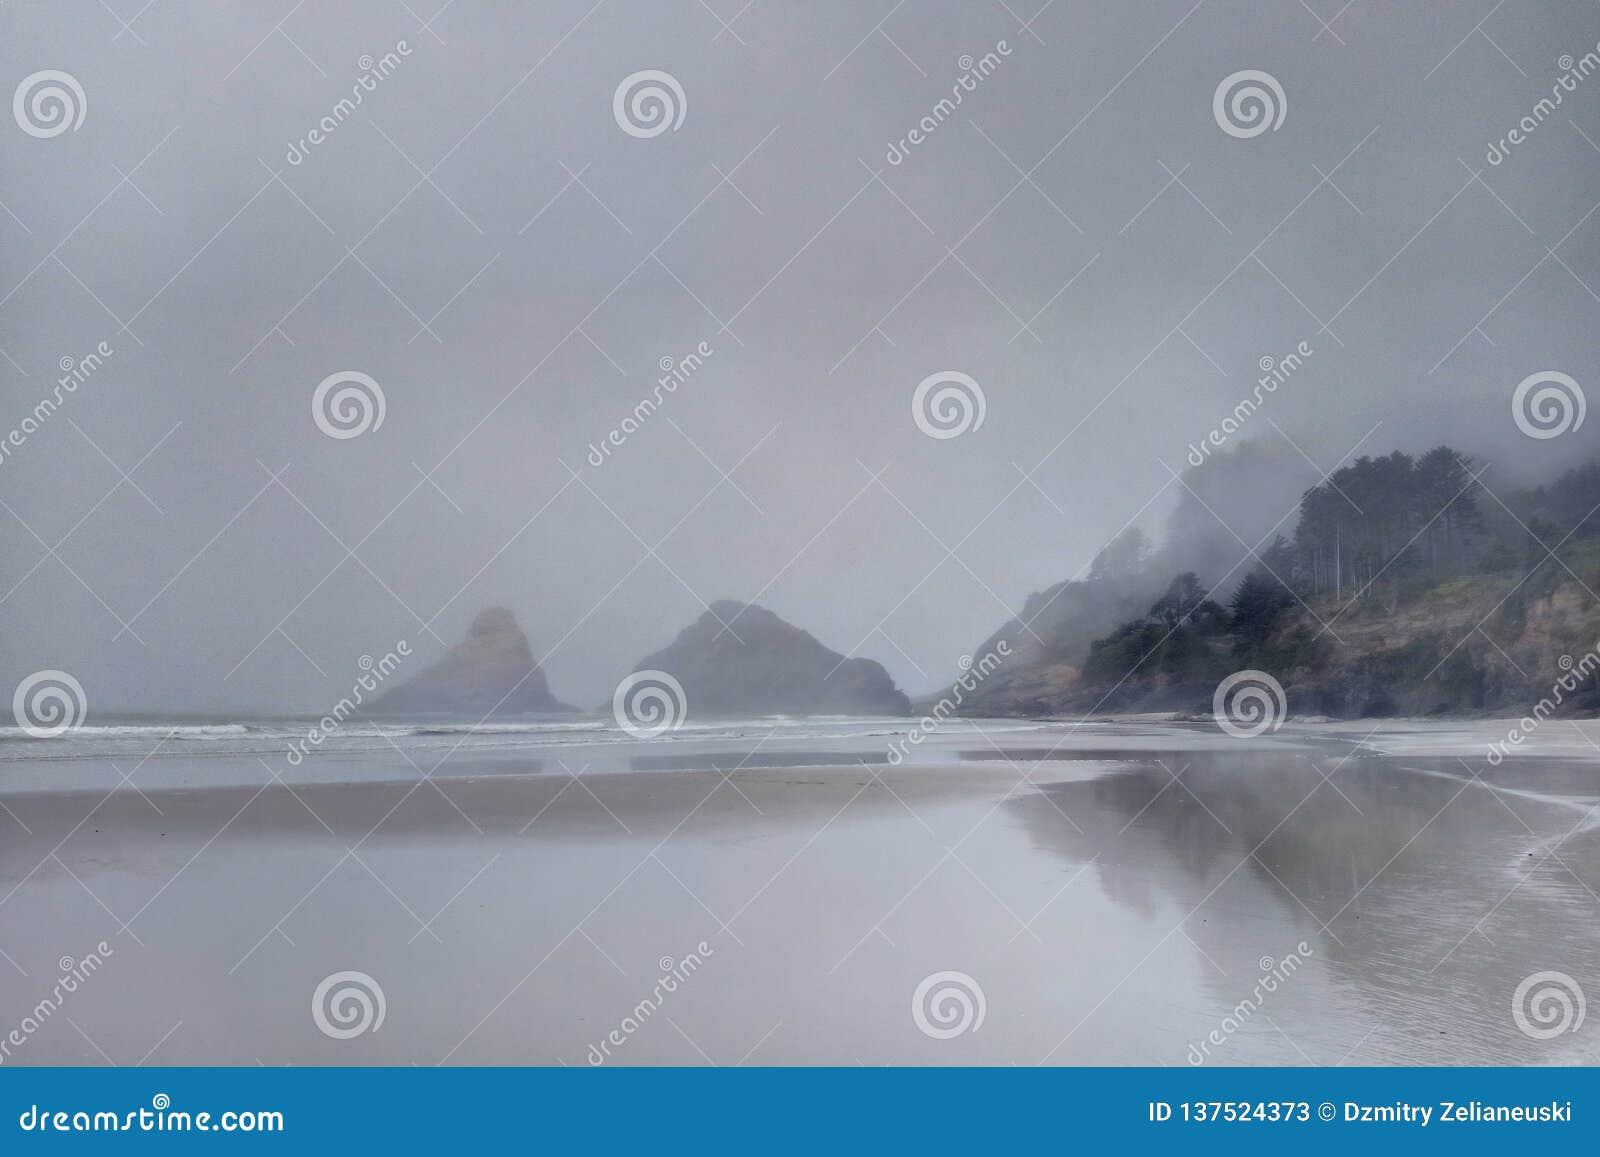 Тихоокеанское побережье рано утром в тумане, Орегоне